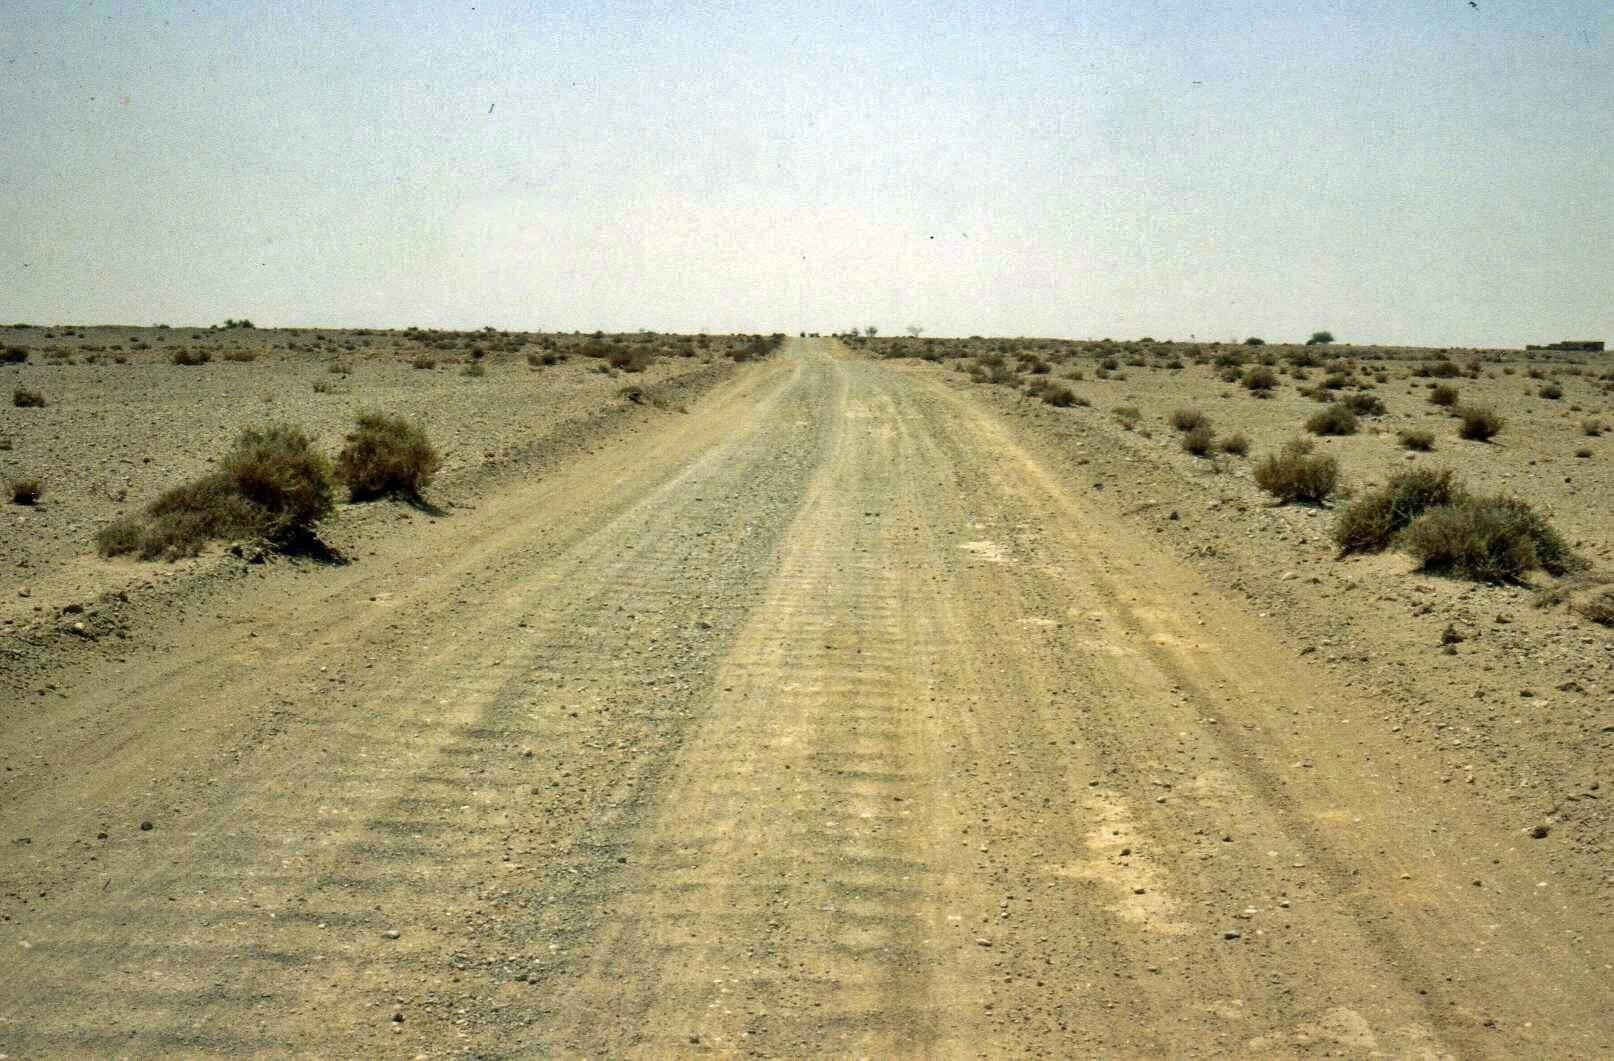 Raid moto 4x4 Tunisie Wild Spot Chebika Gafsa tôle ondulée